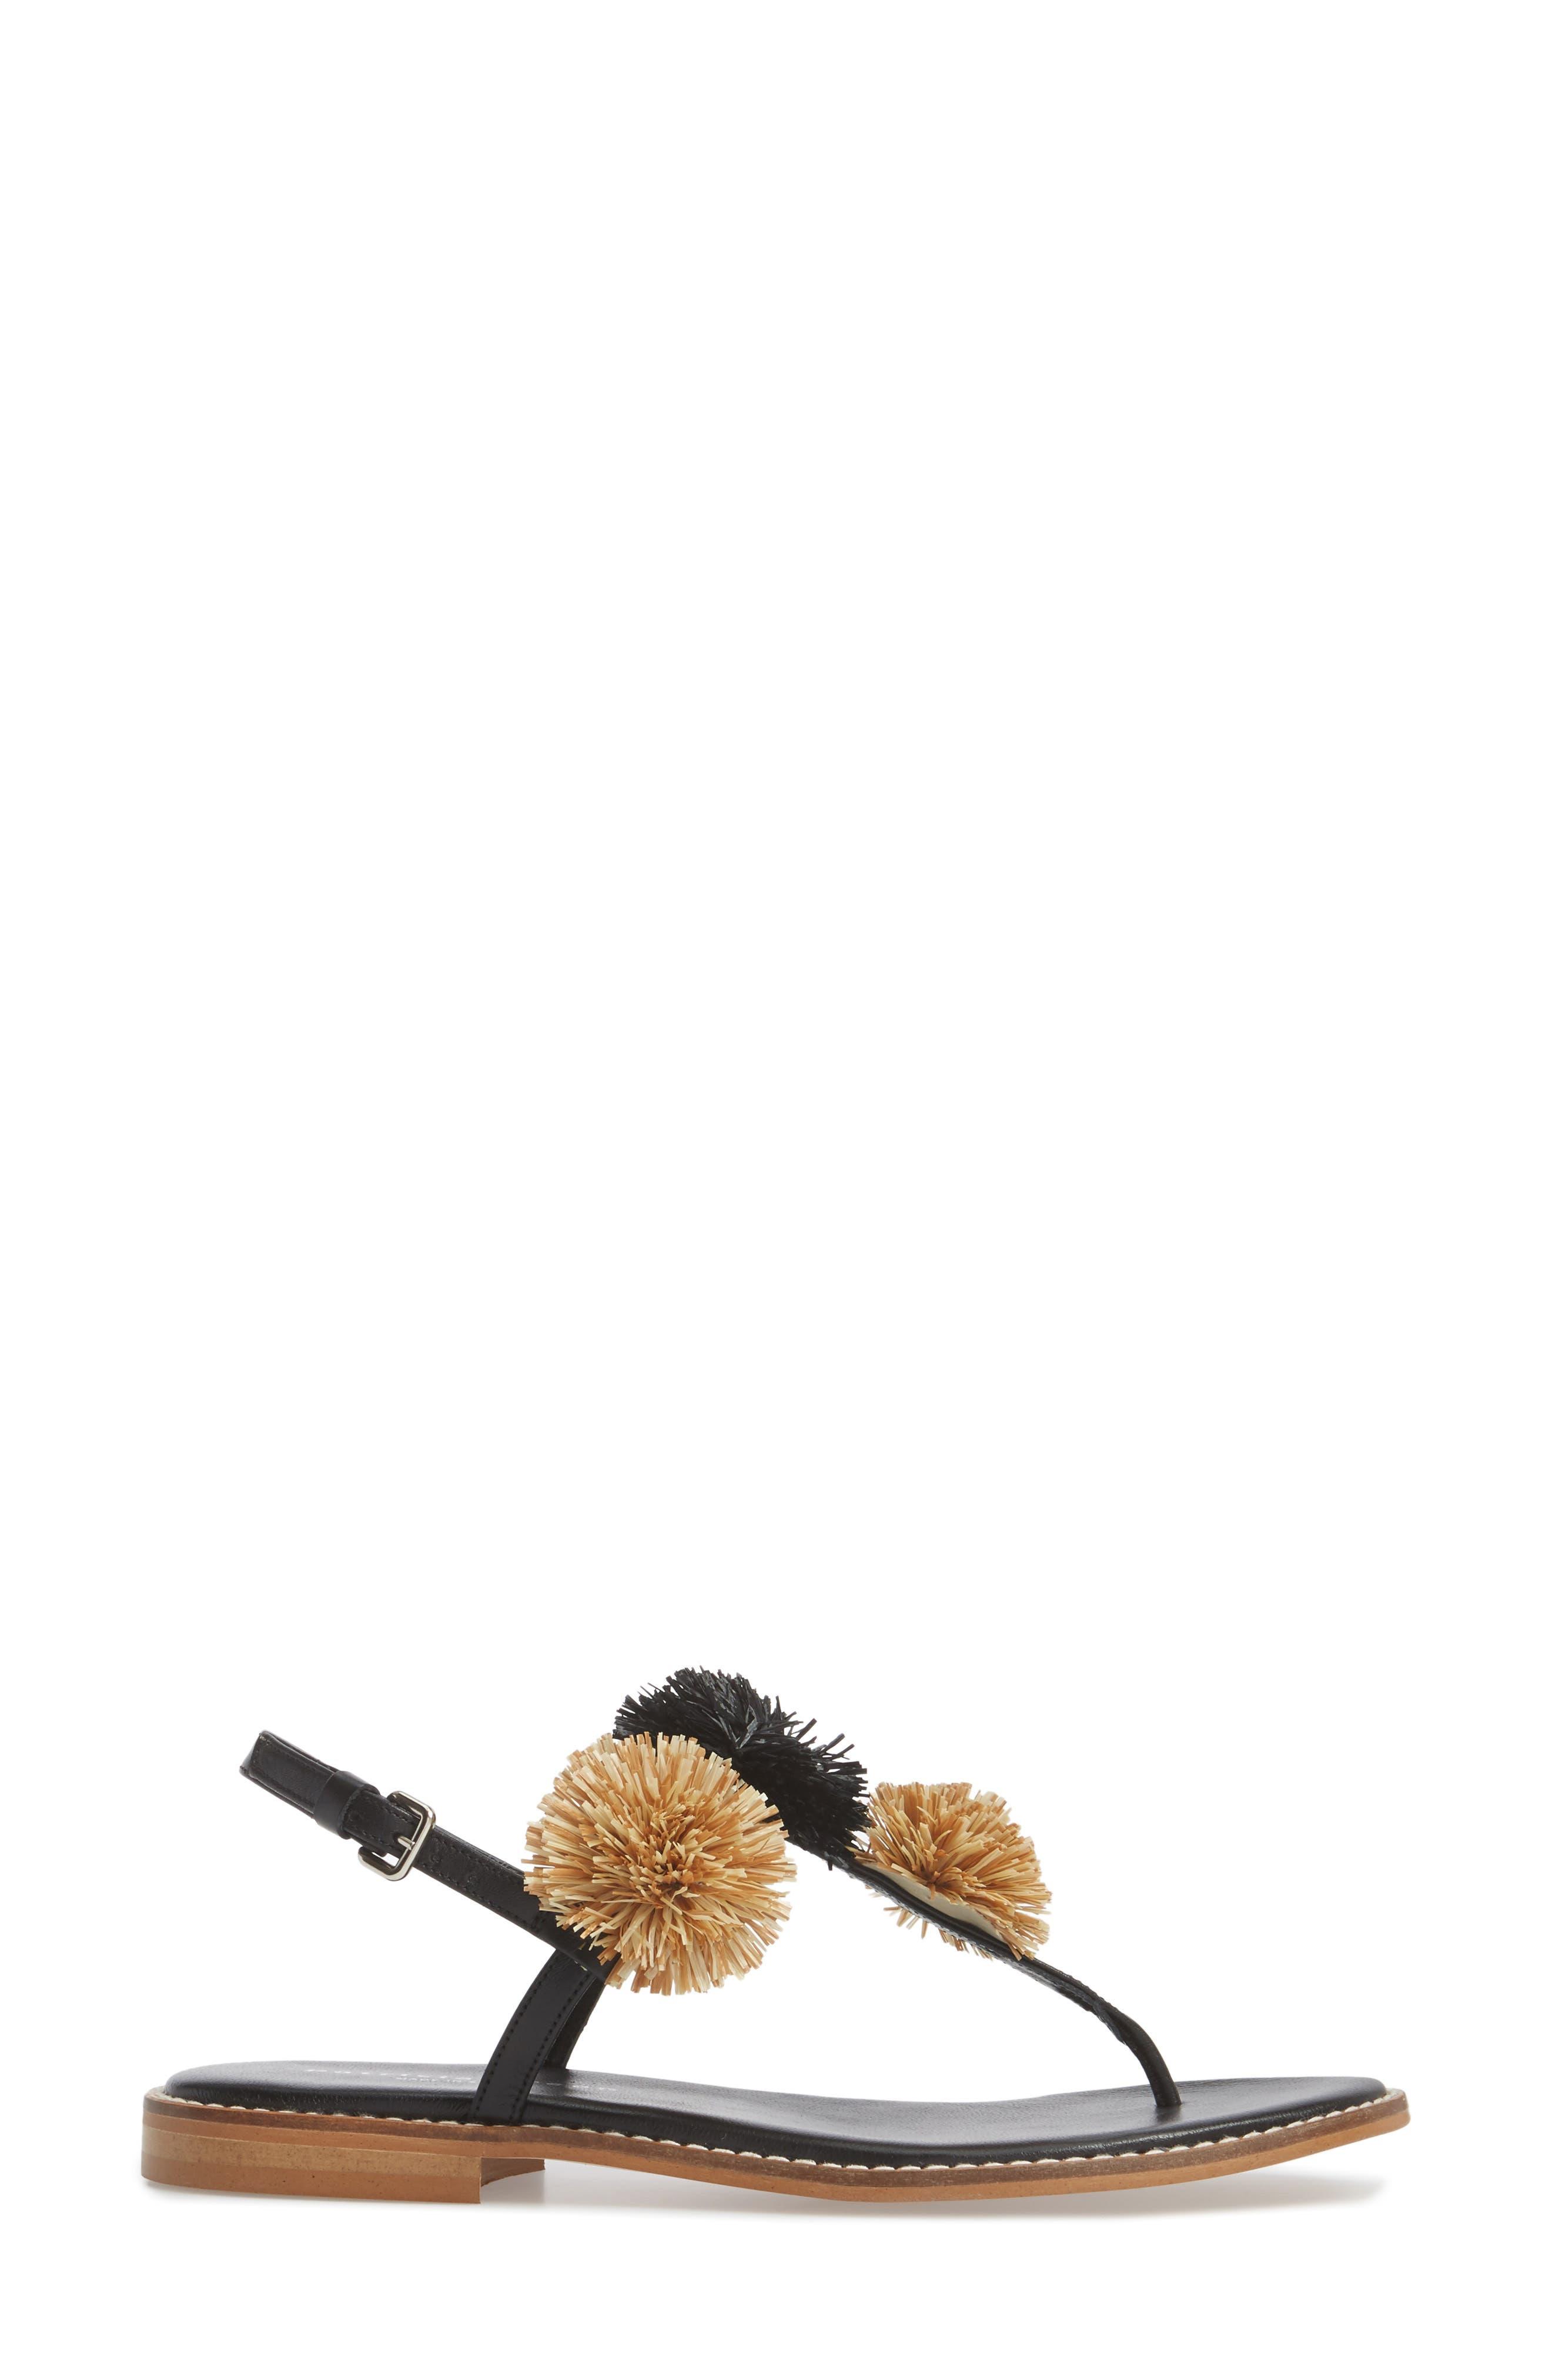 Pompom Thong Sandal,                             Alternate thumbnail 3, color,                             Black Leather